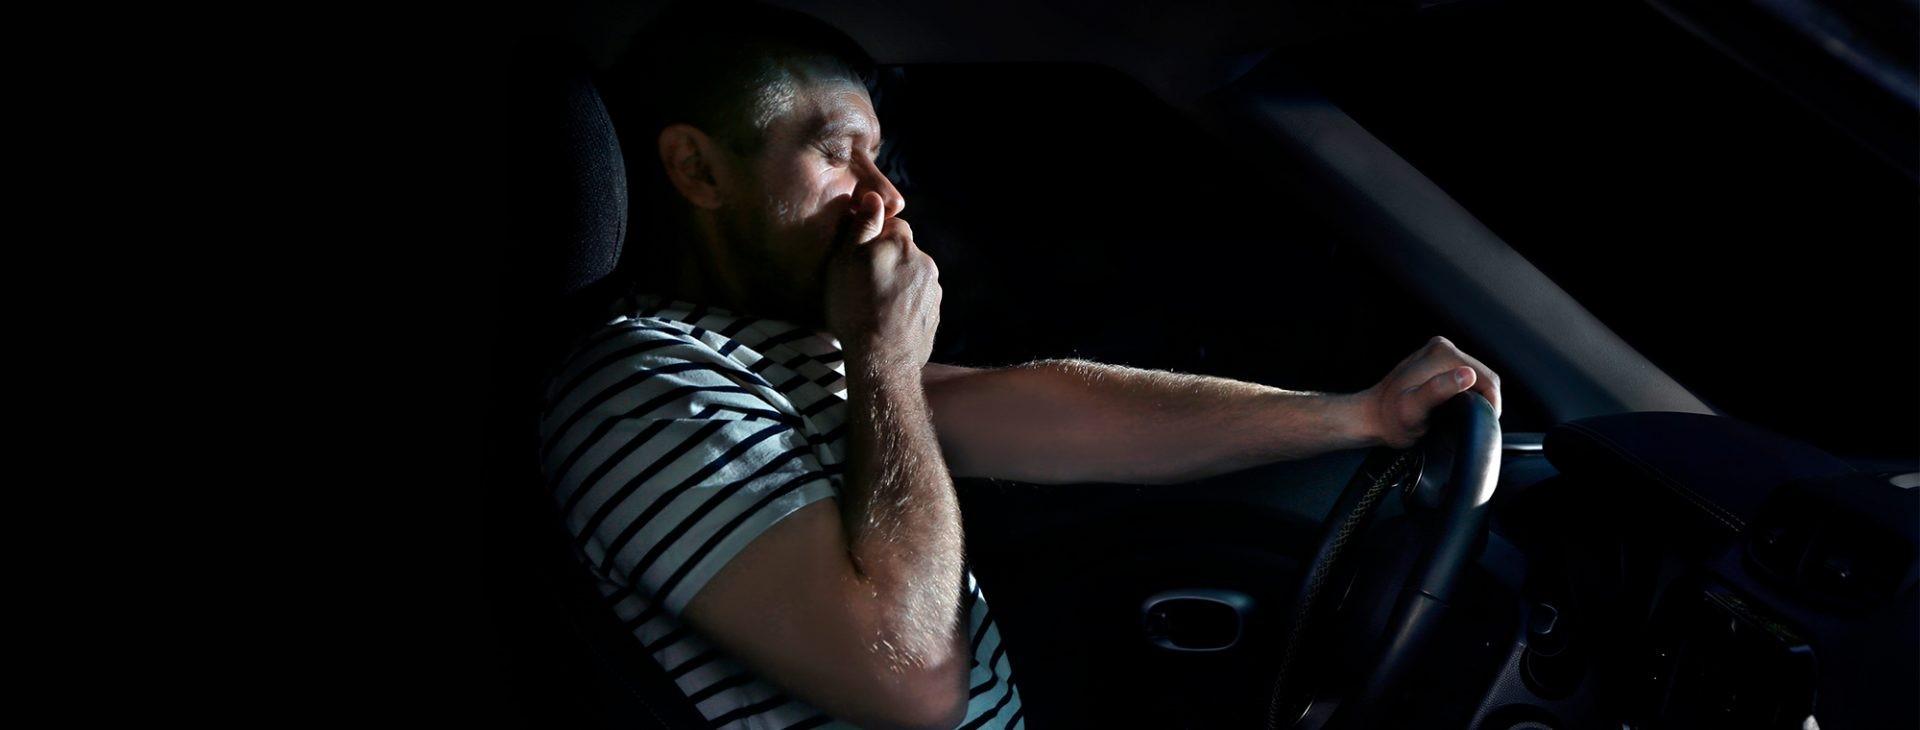 SKODA μικρο-ύπνος στο αυτοκίνητο